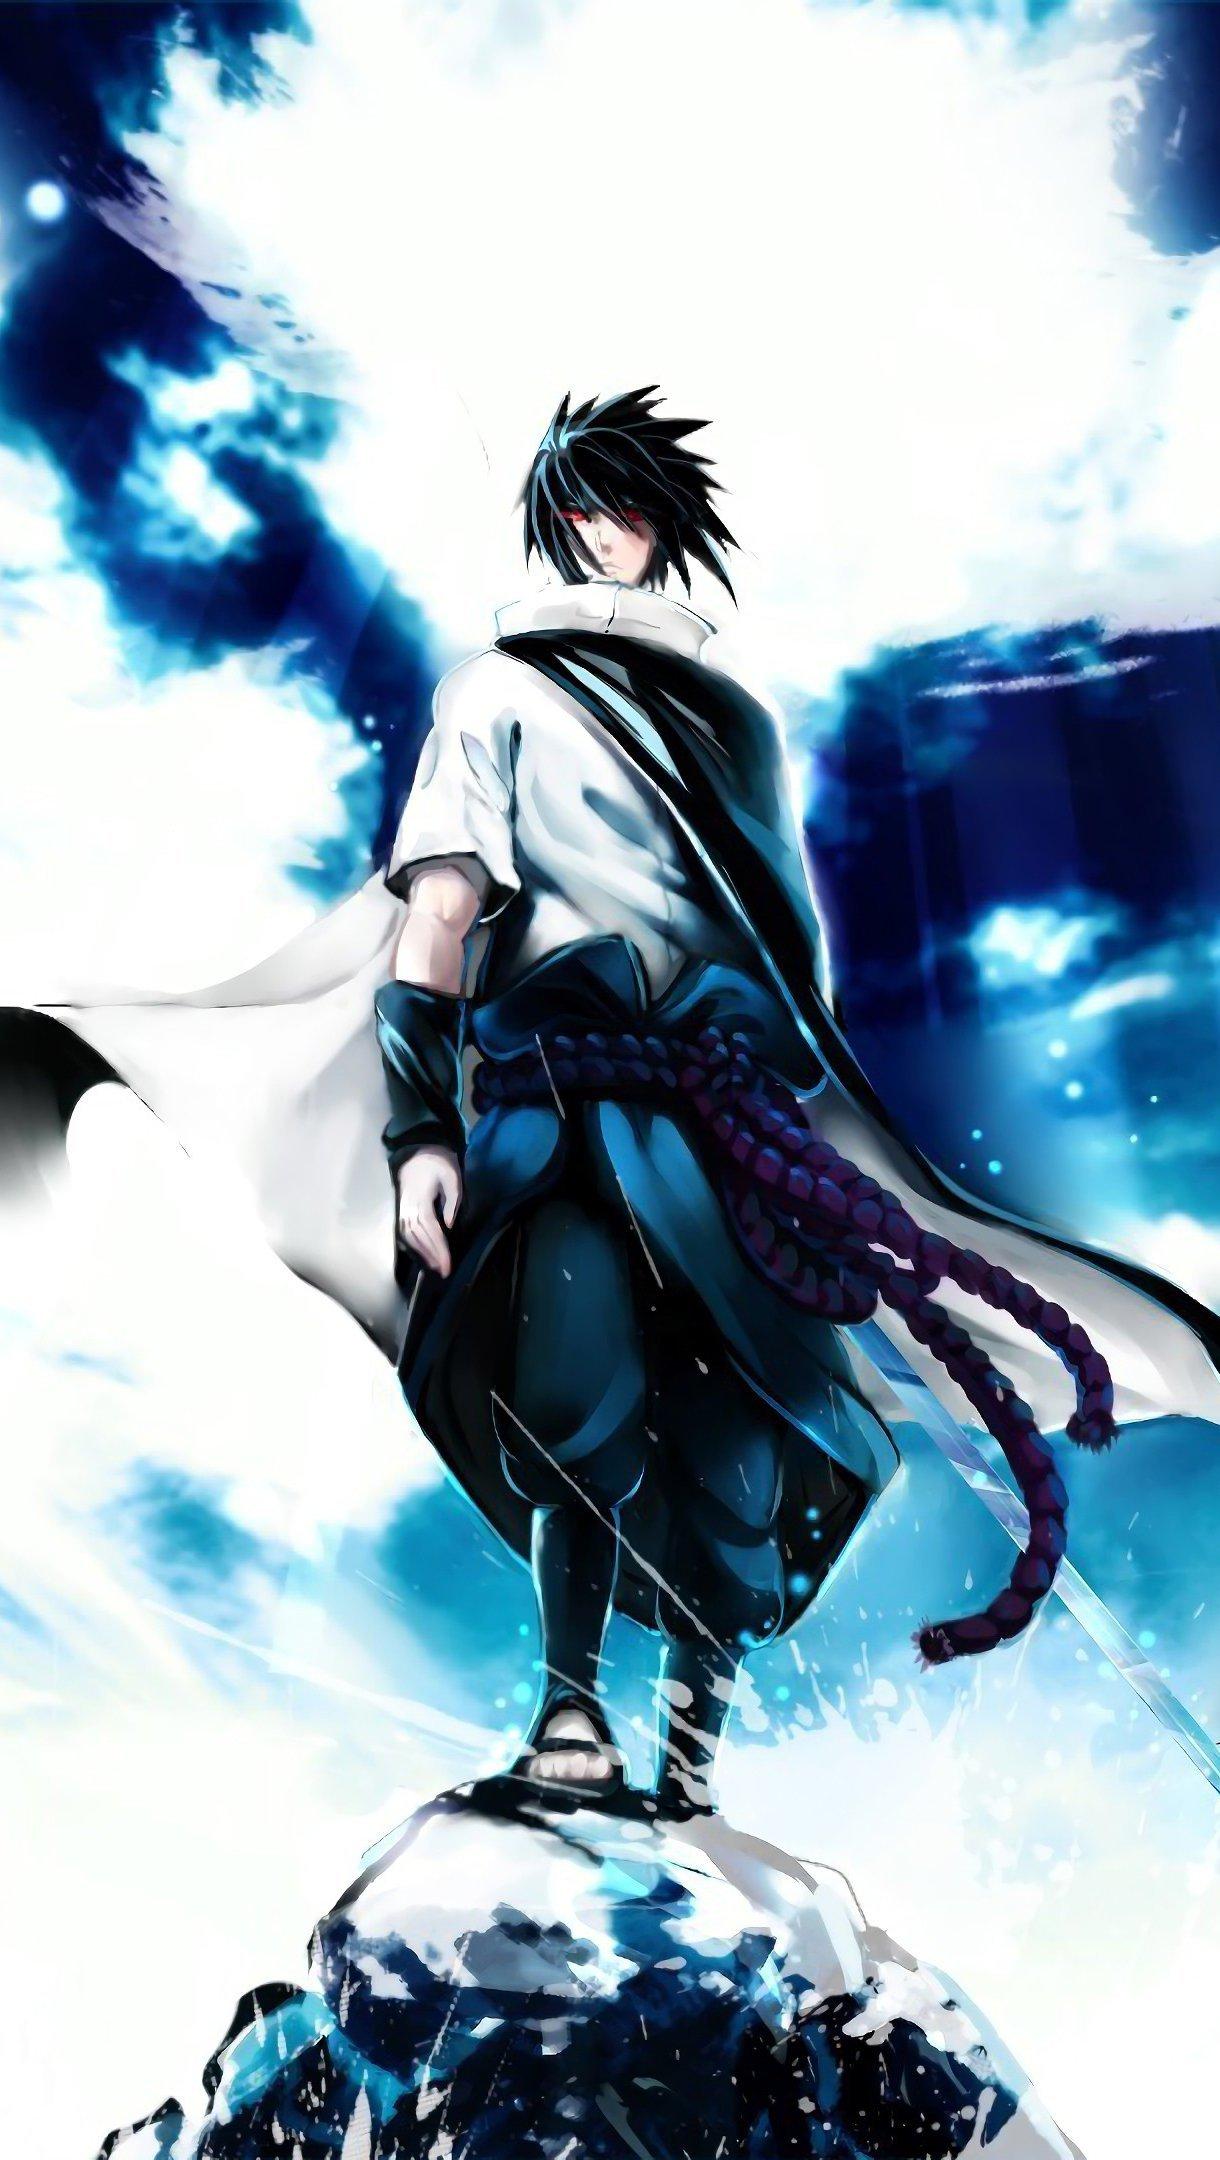 Fondos de pantalla Anime Sasuke Uchiha Vertical